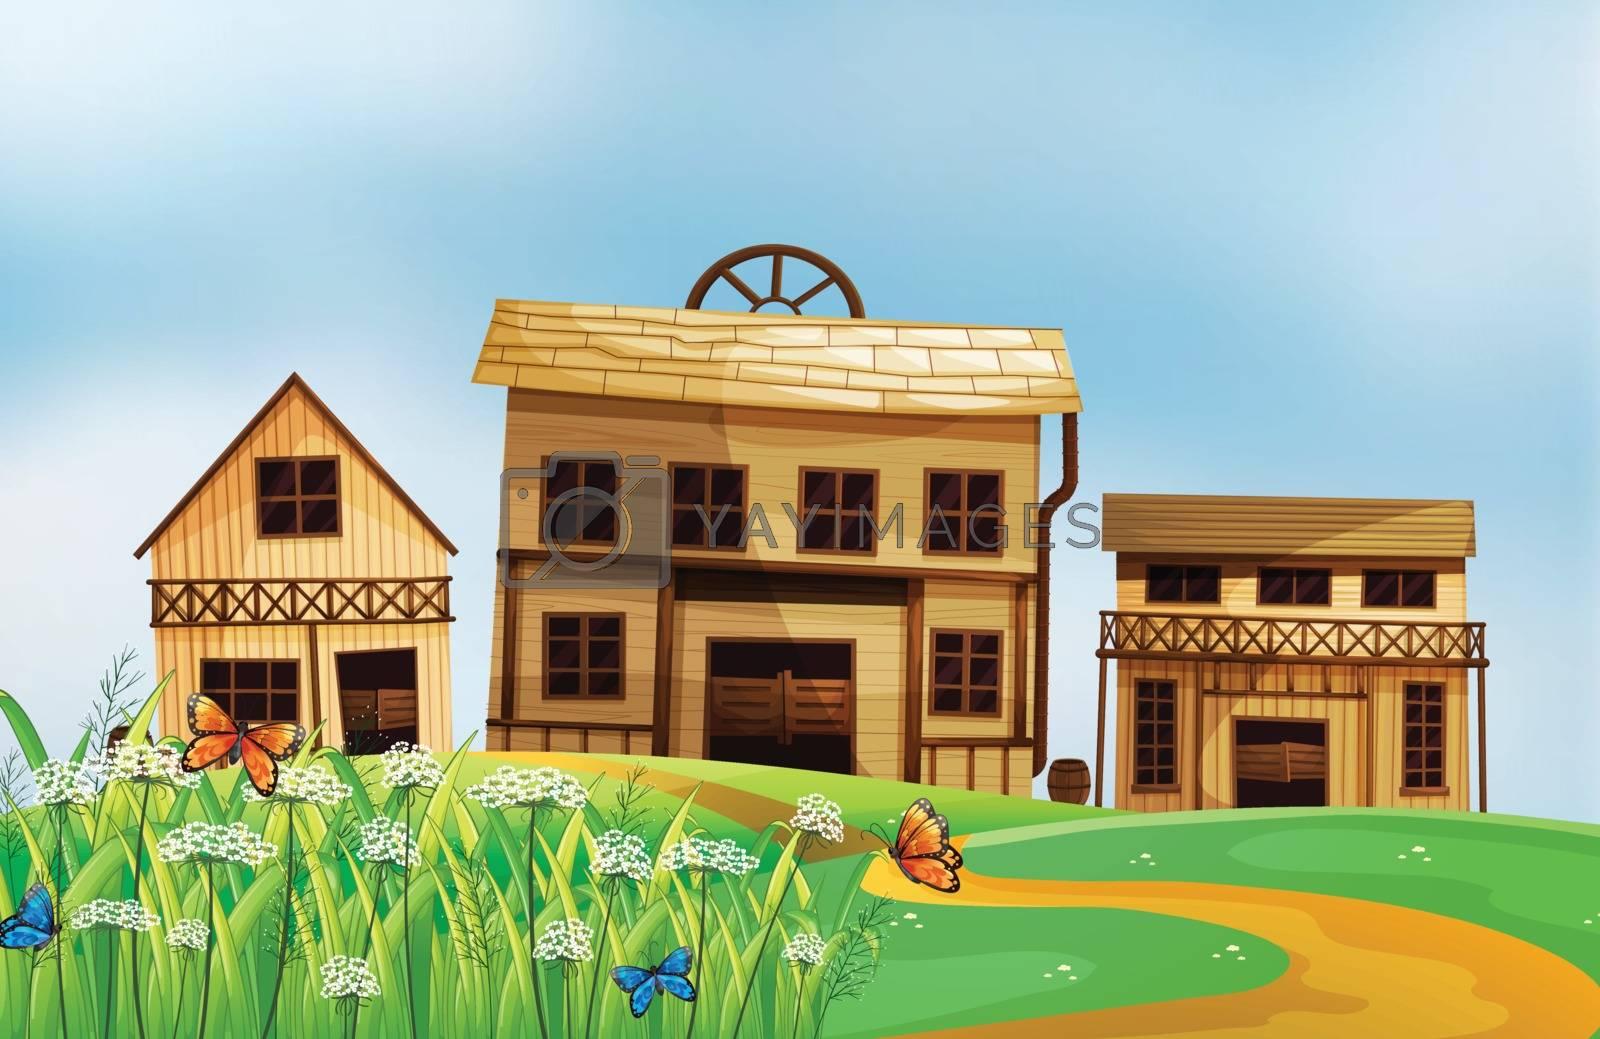 Illustration of houses in the neighborhood